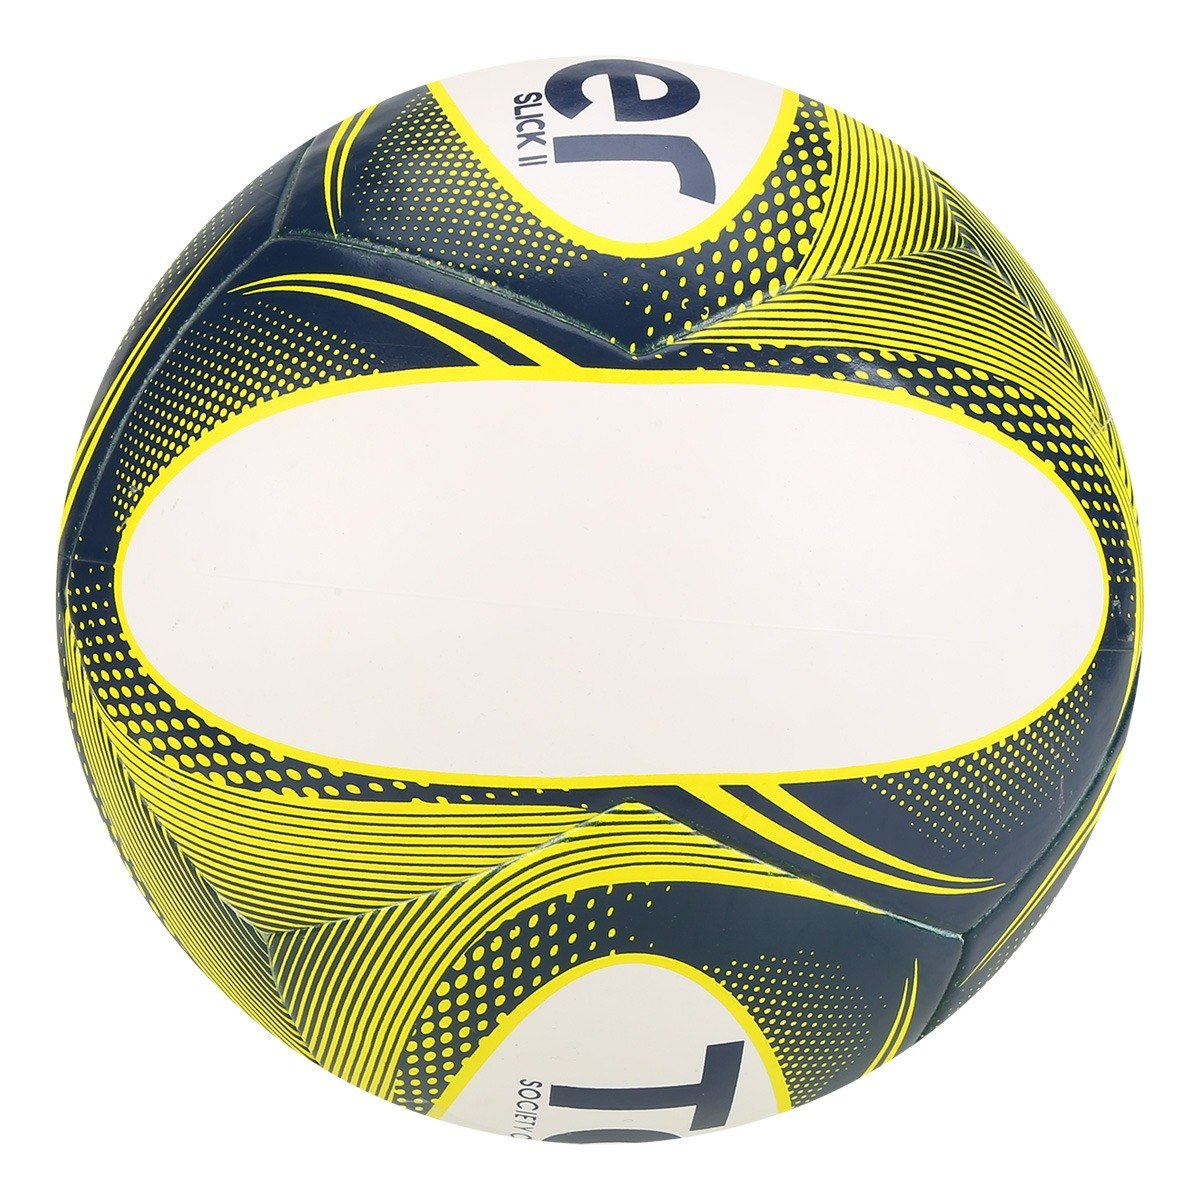 f00d1166d6 Bola Futsal Topper Slick Ii - Original - R  55